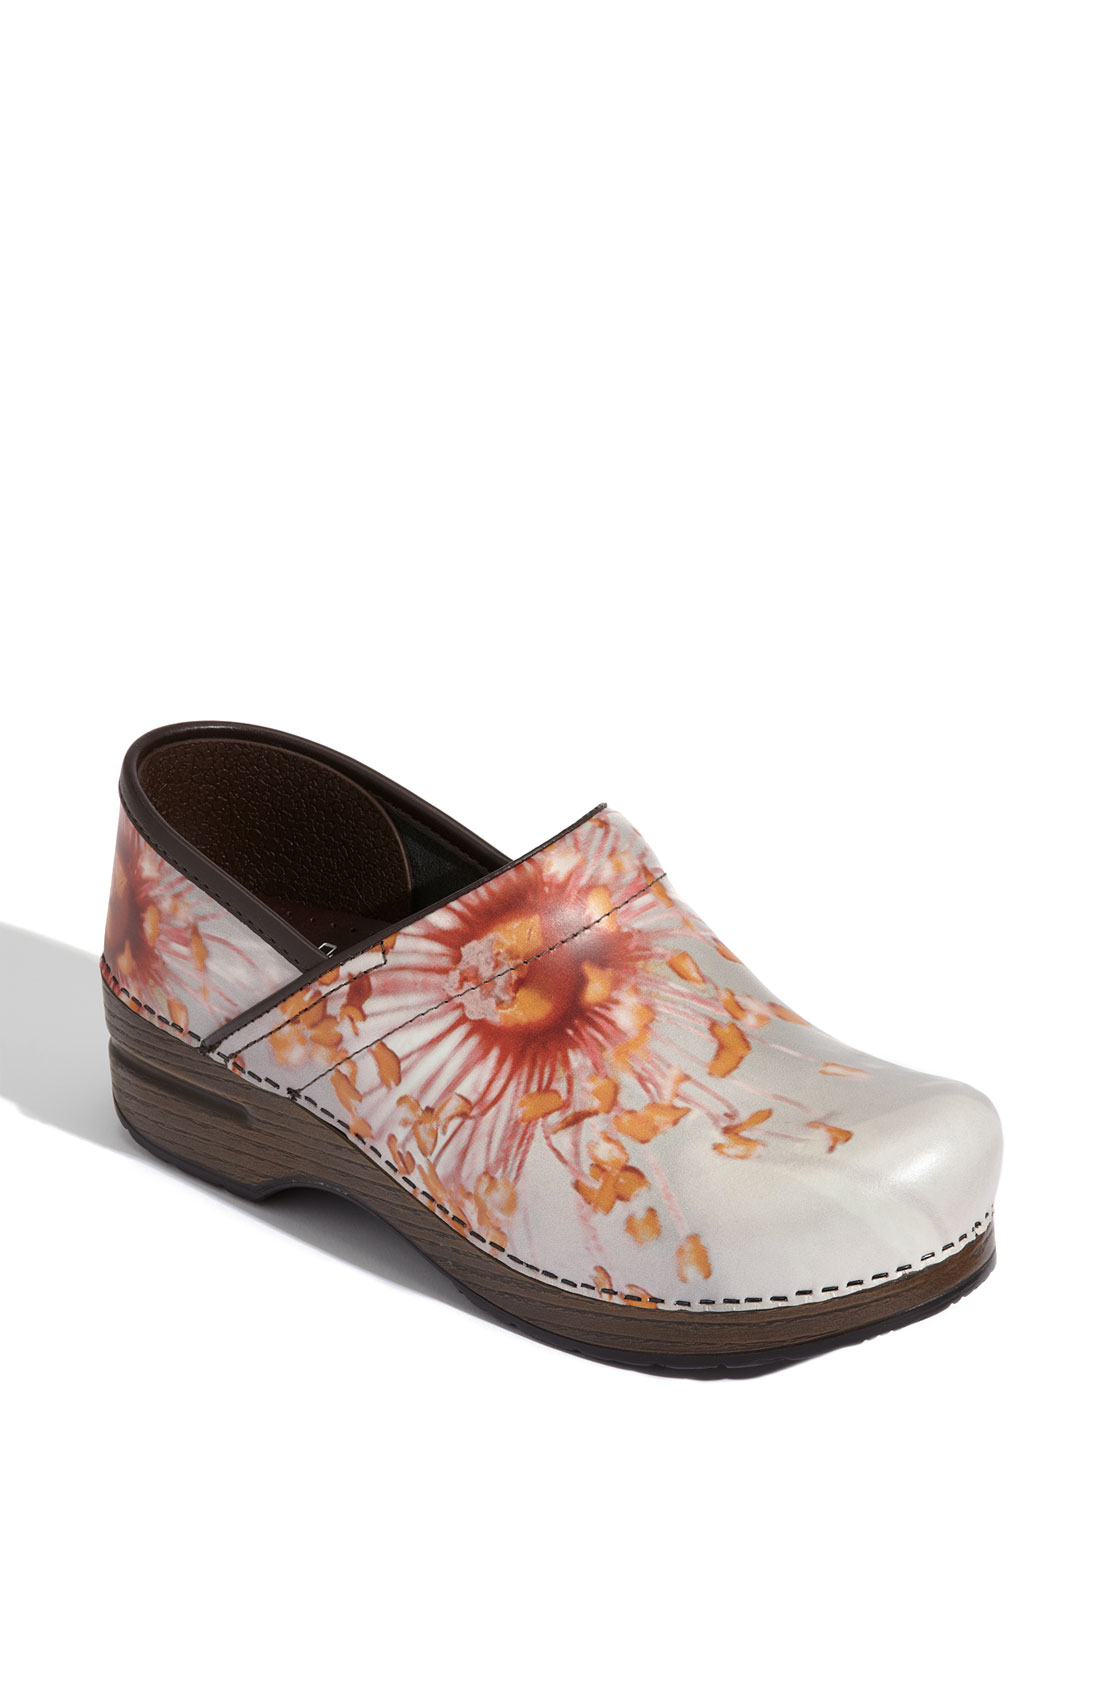 Dansko Shoes Uk